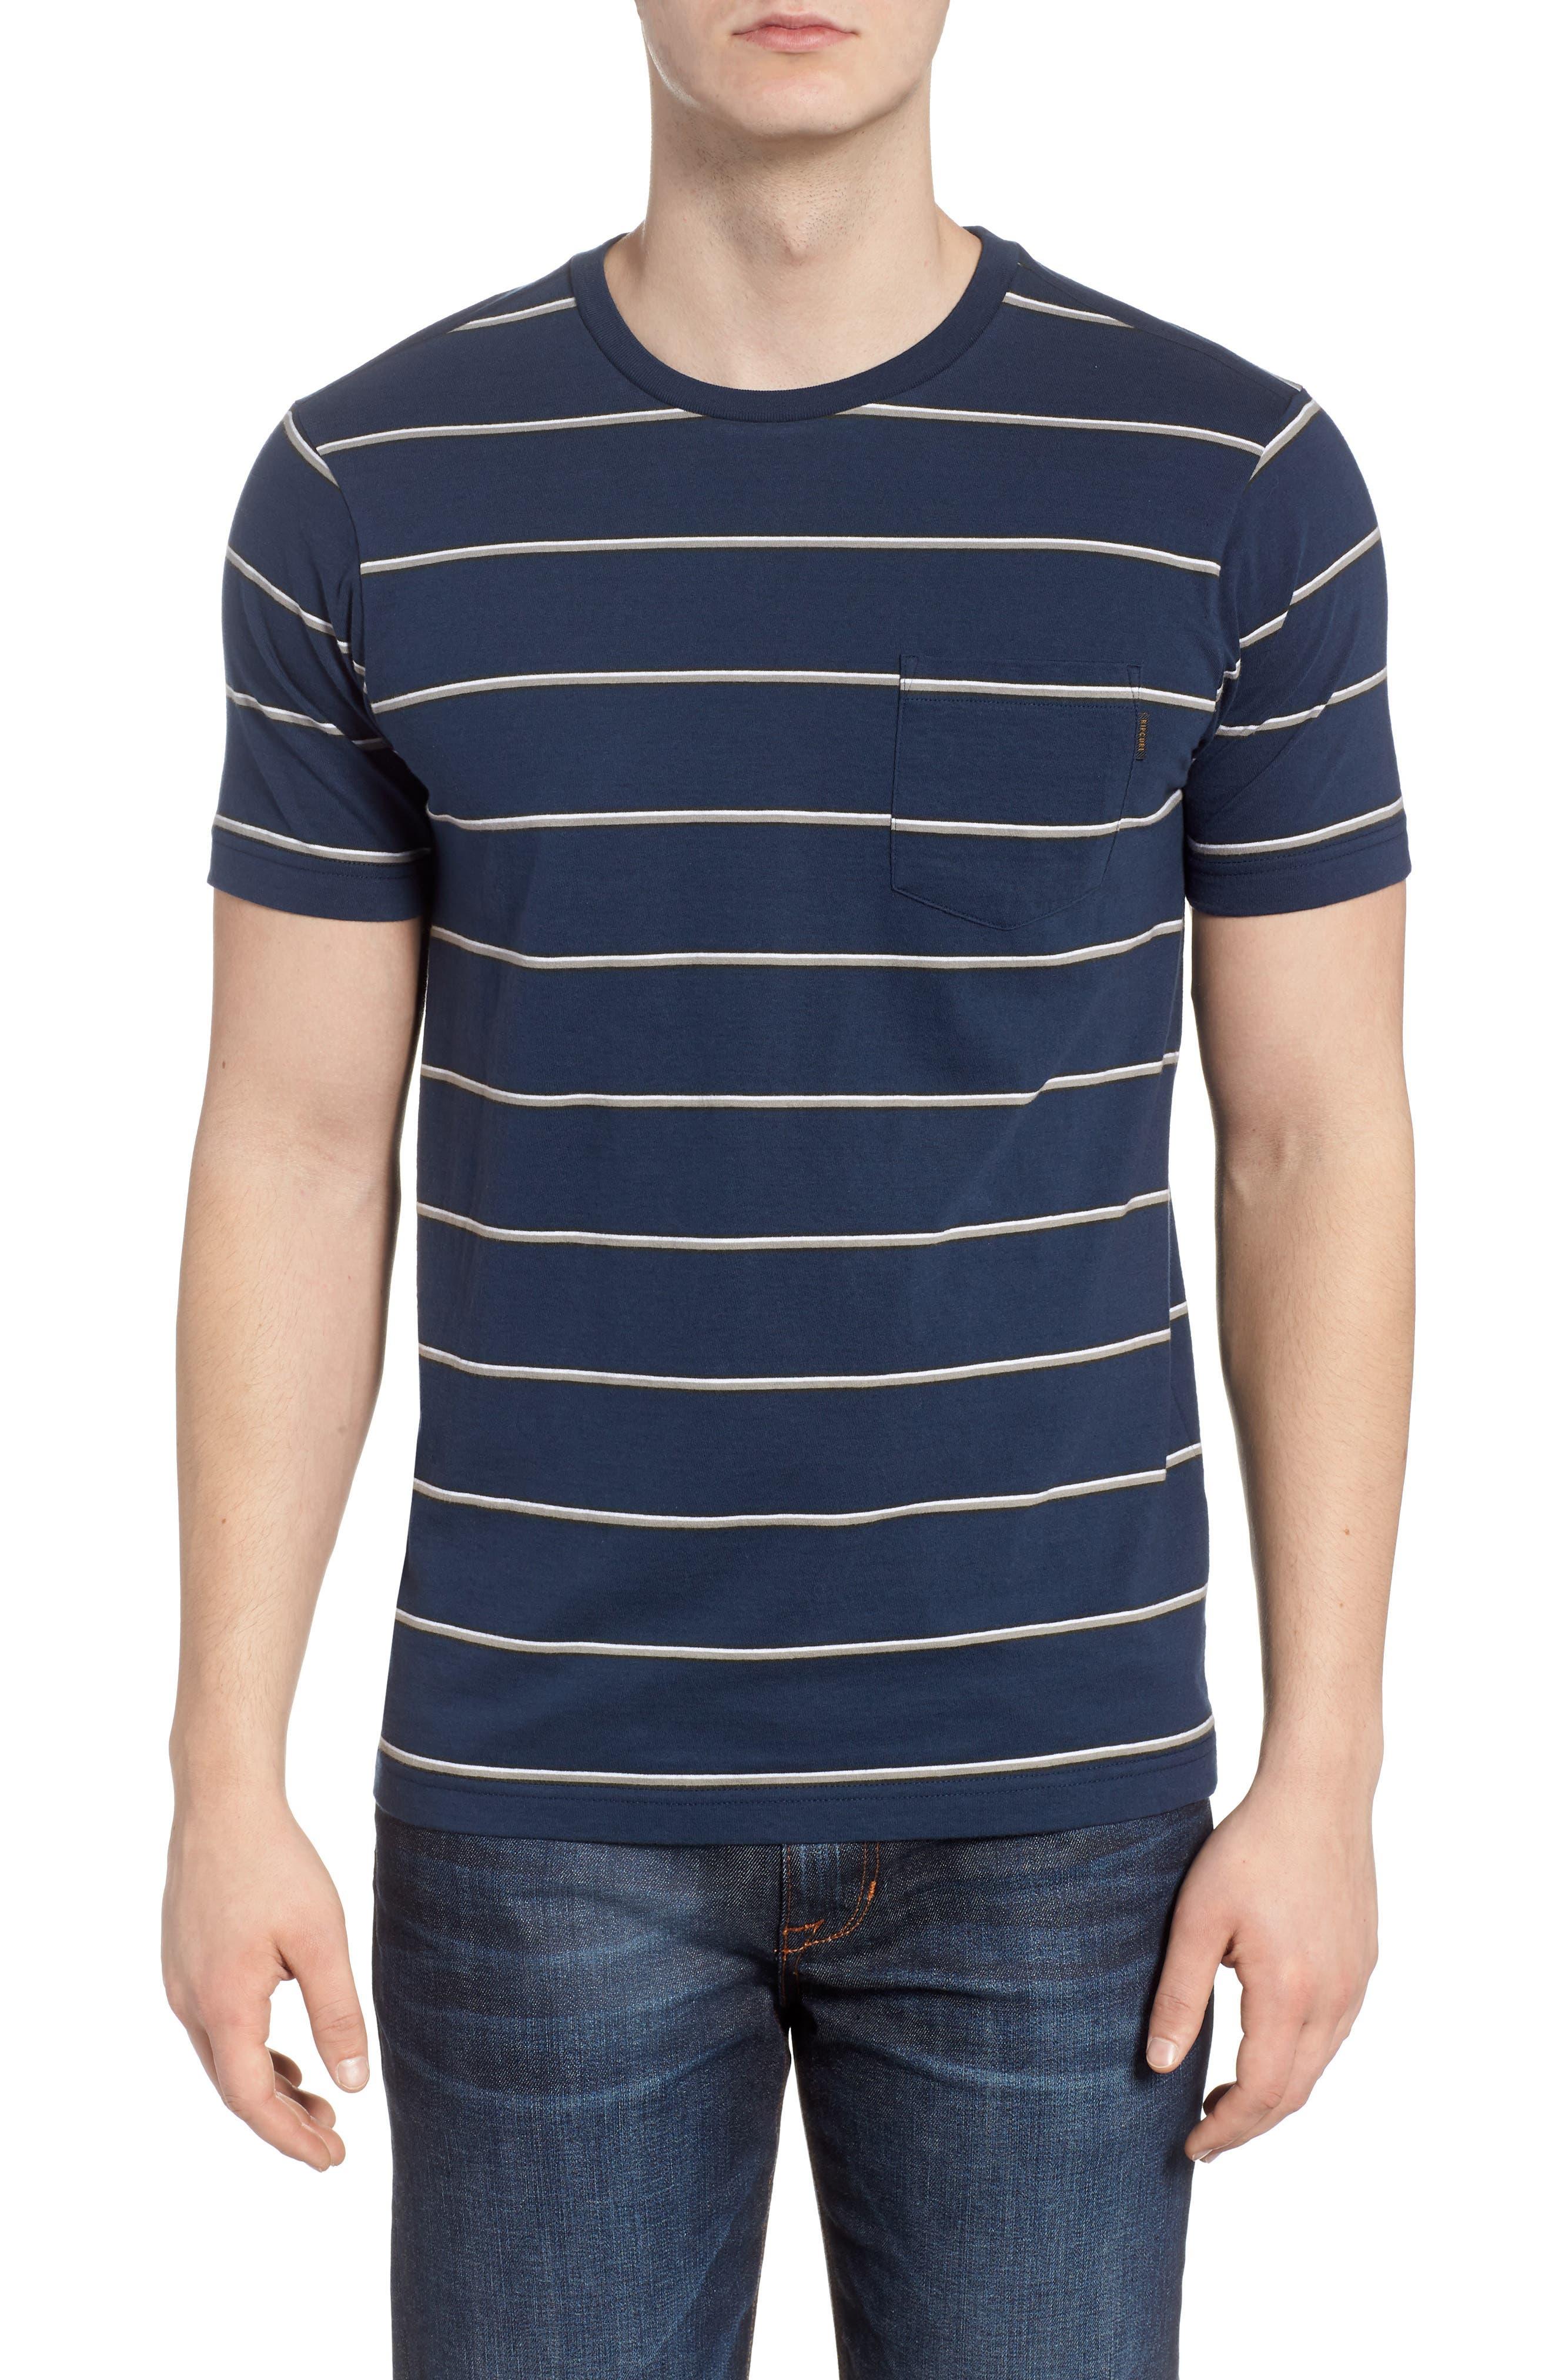 Rip Curl Prospect T-Shirt